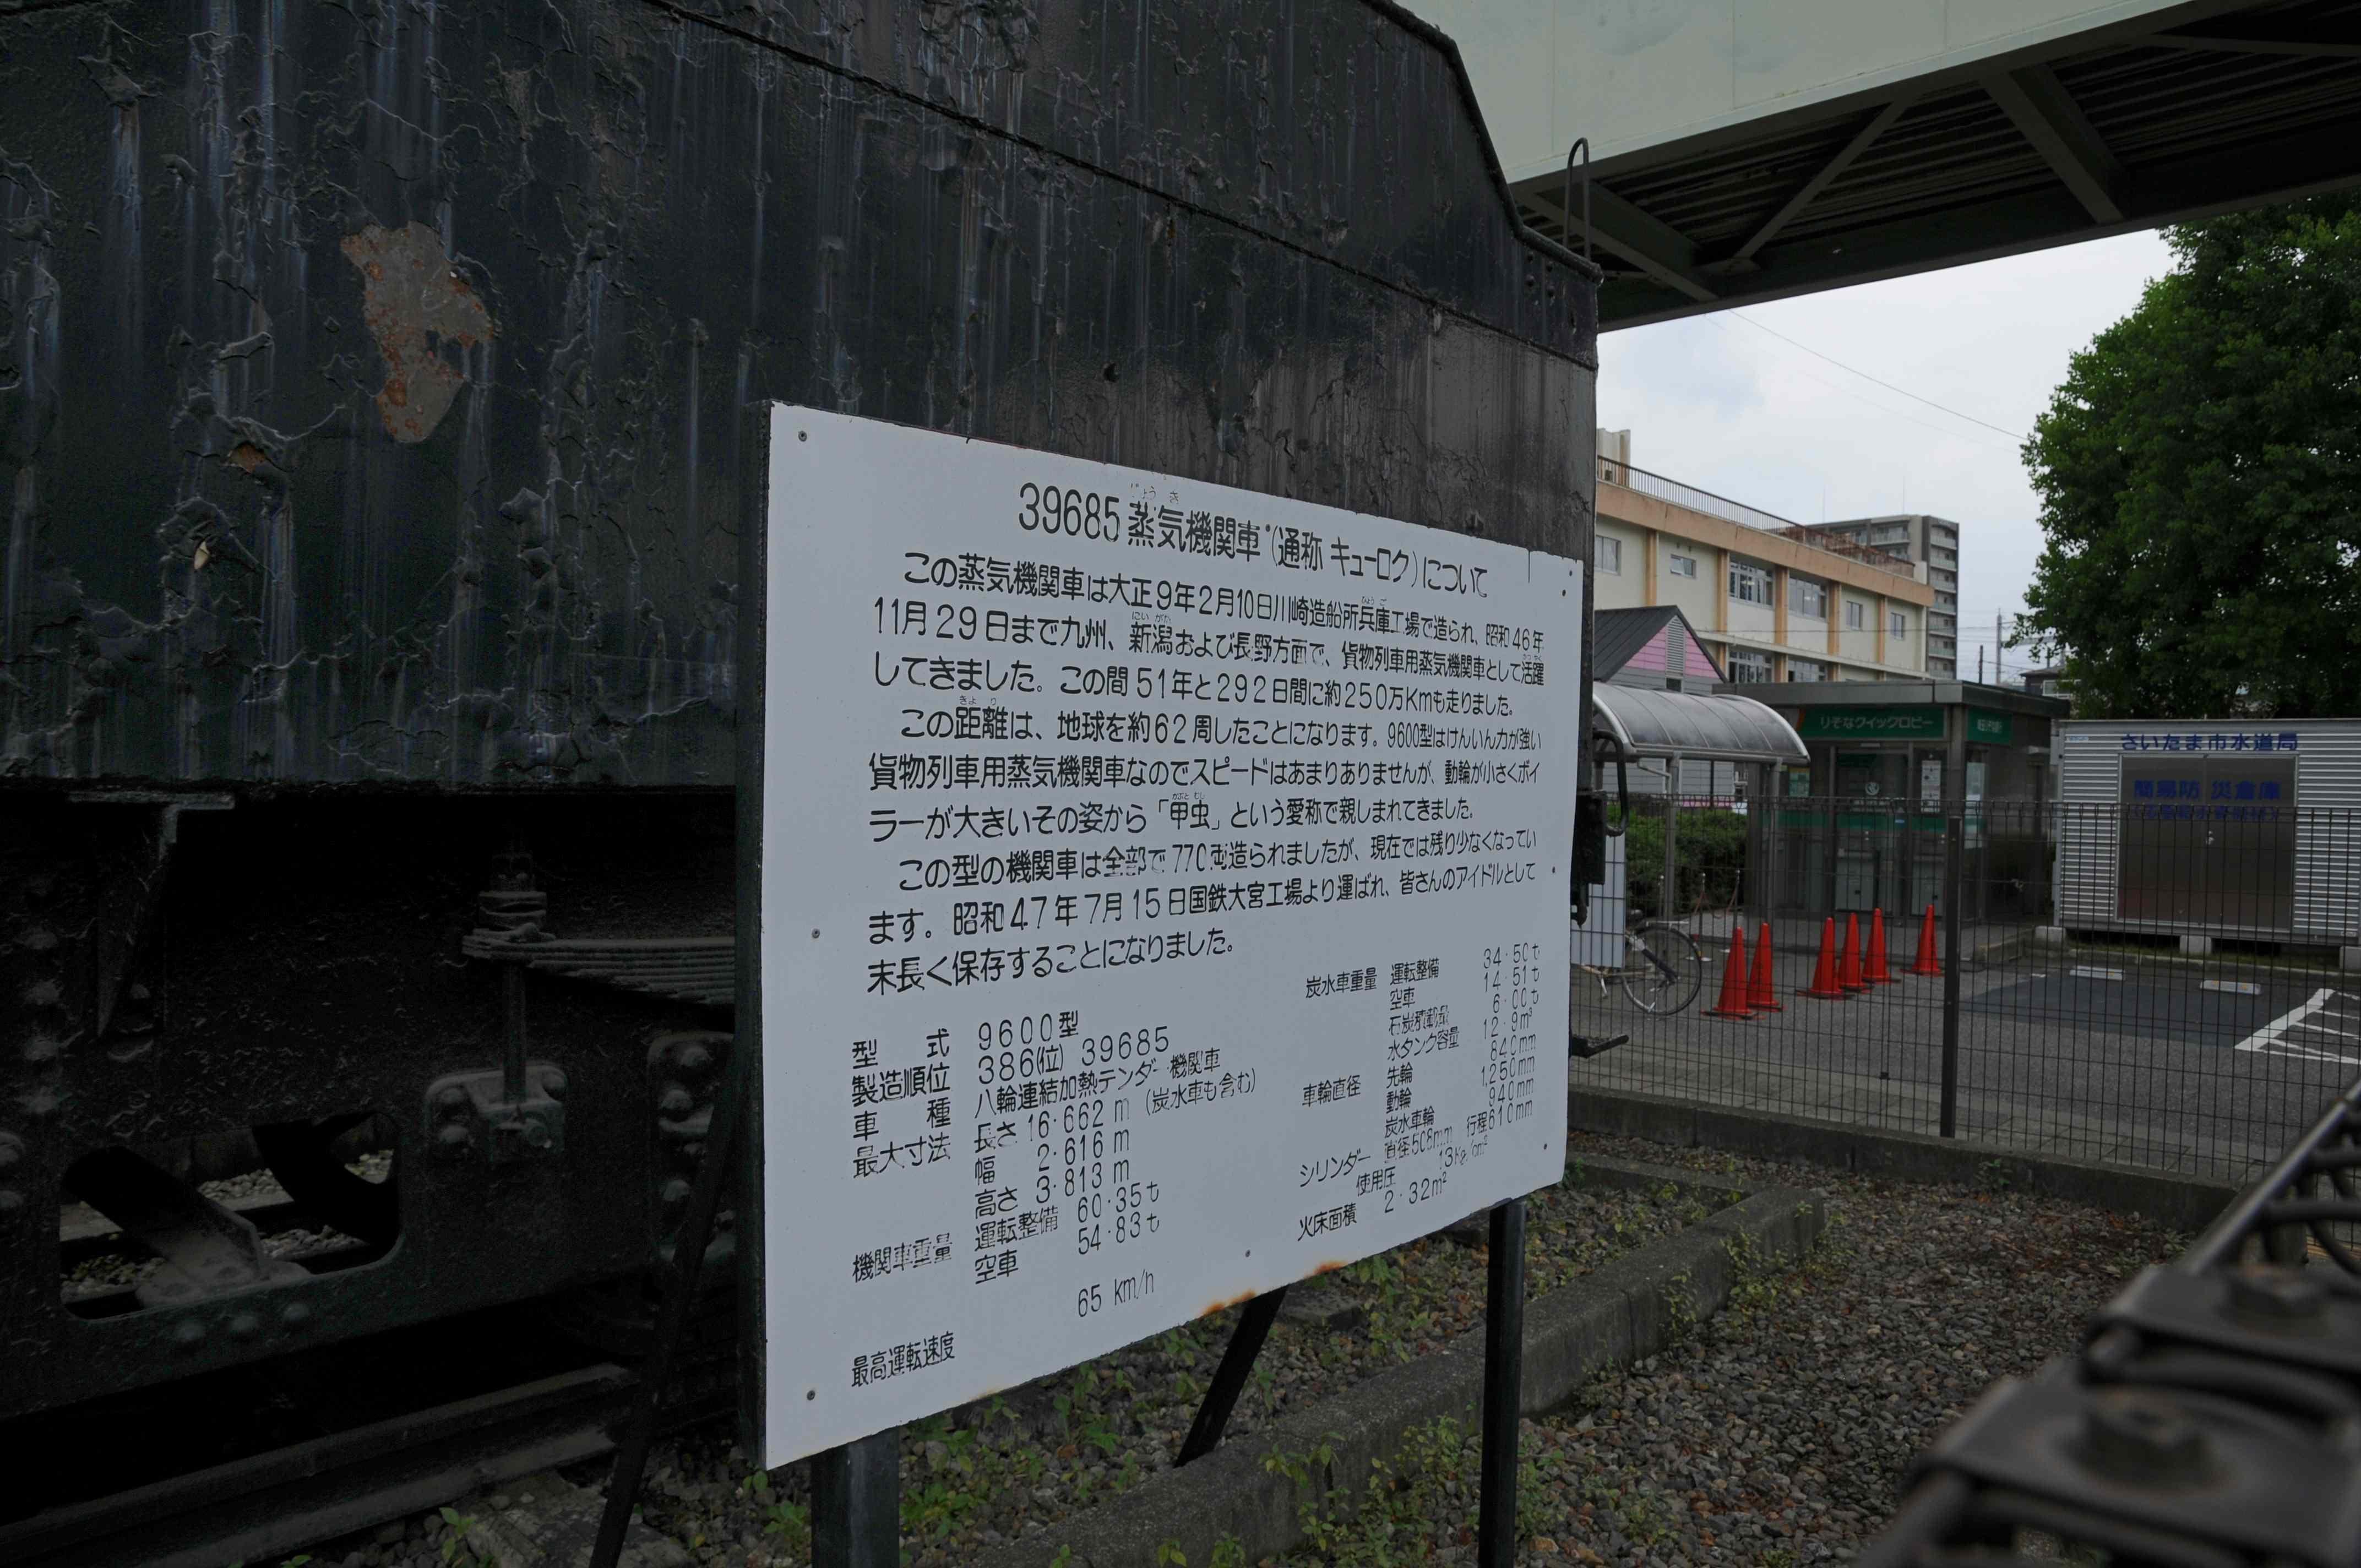 DSC_7565-1.jpg